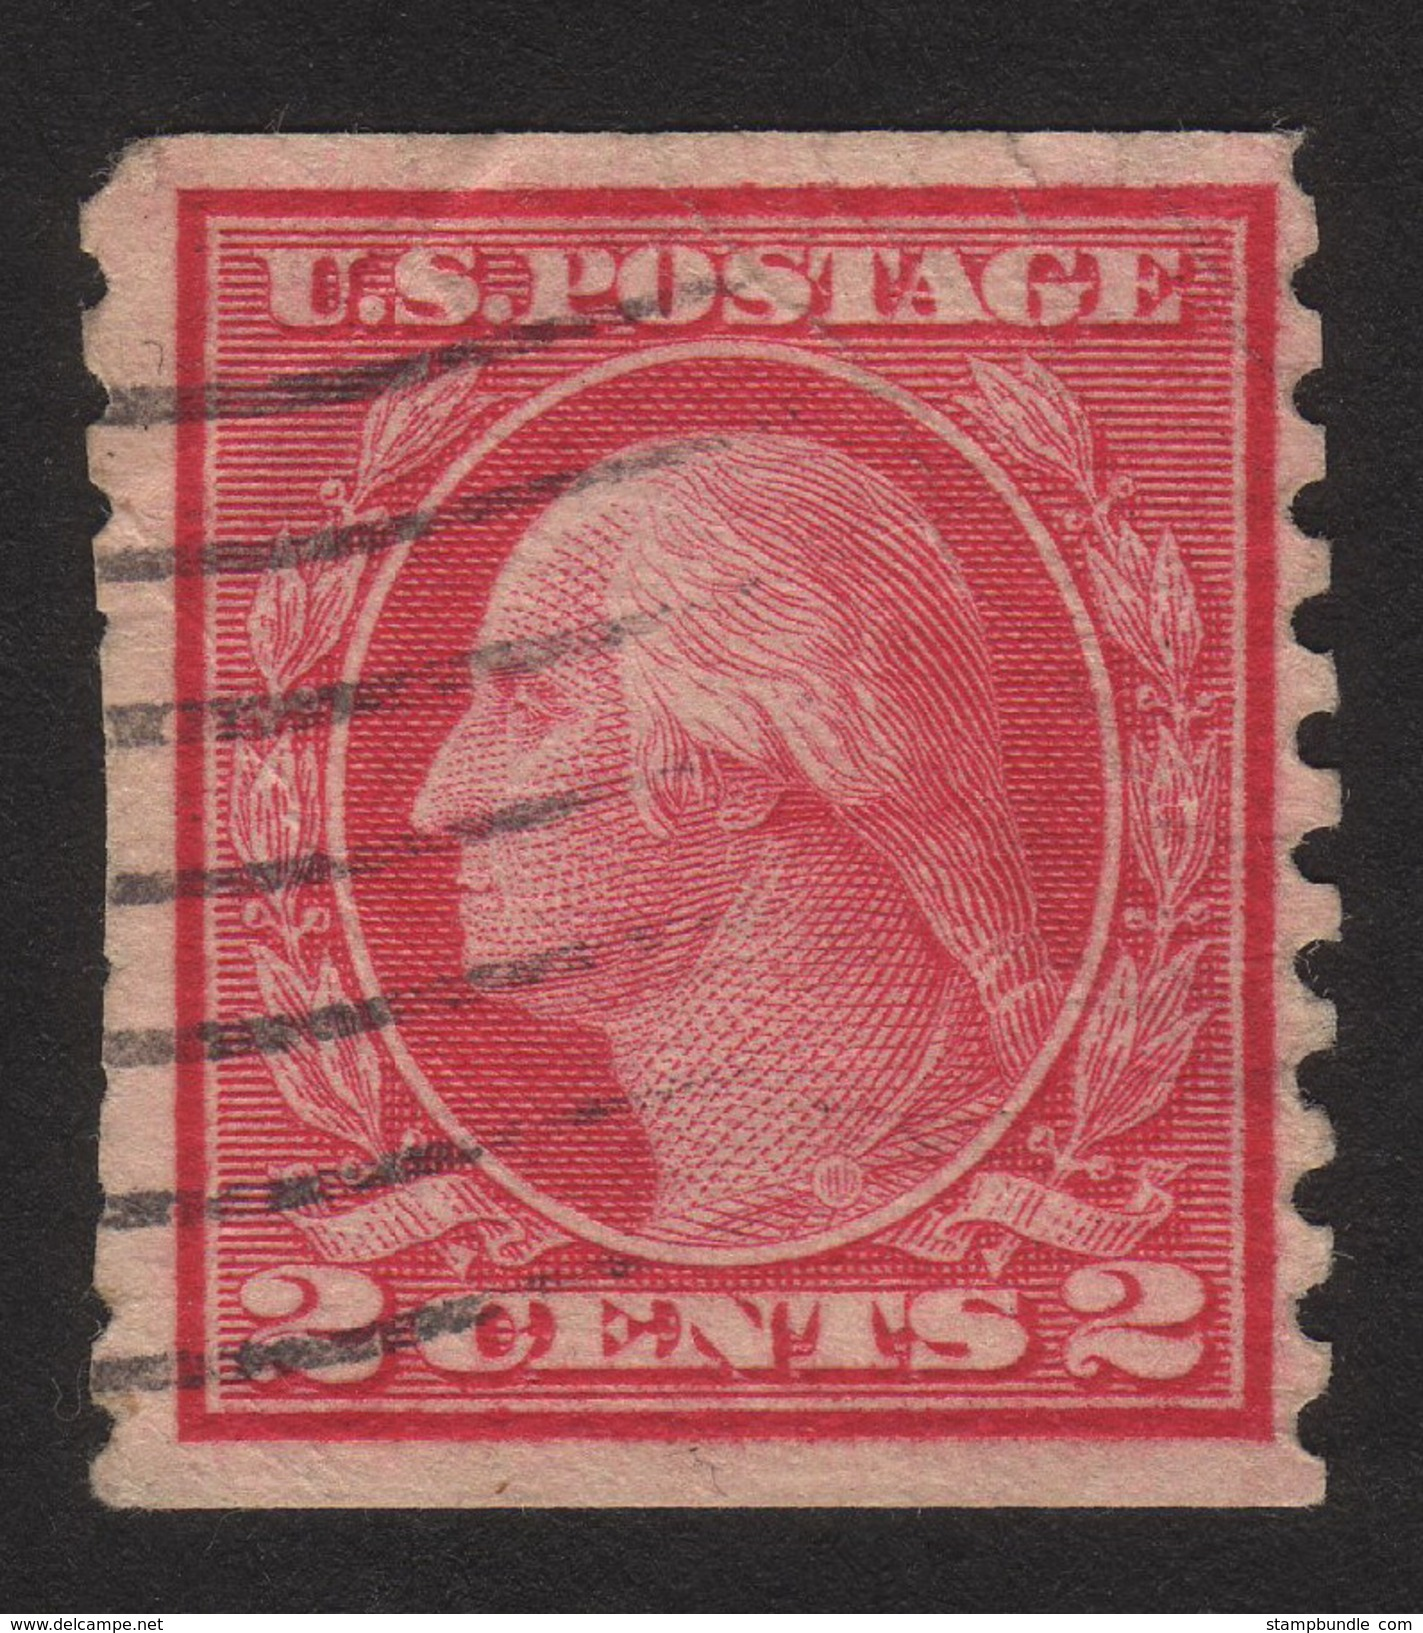 1915 US, 2c Stamp, Used, George Washington, Sc 454 - Used Stamps